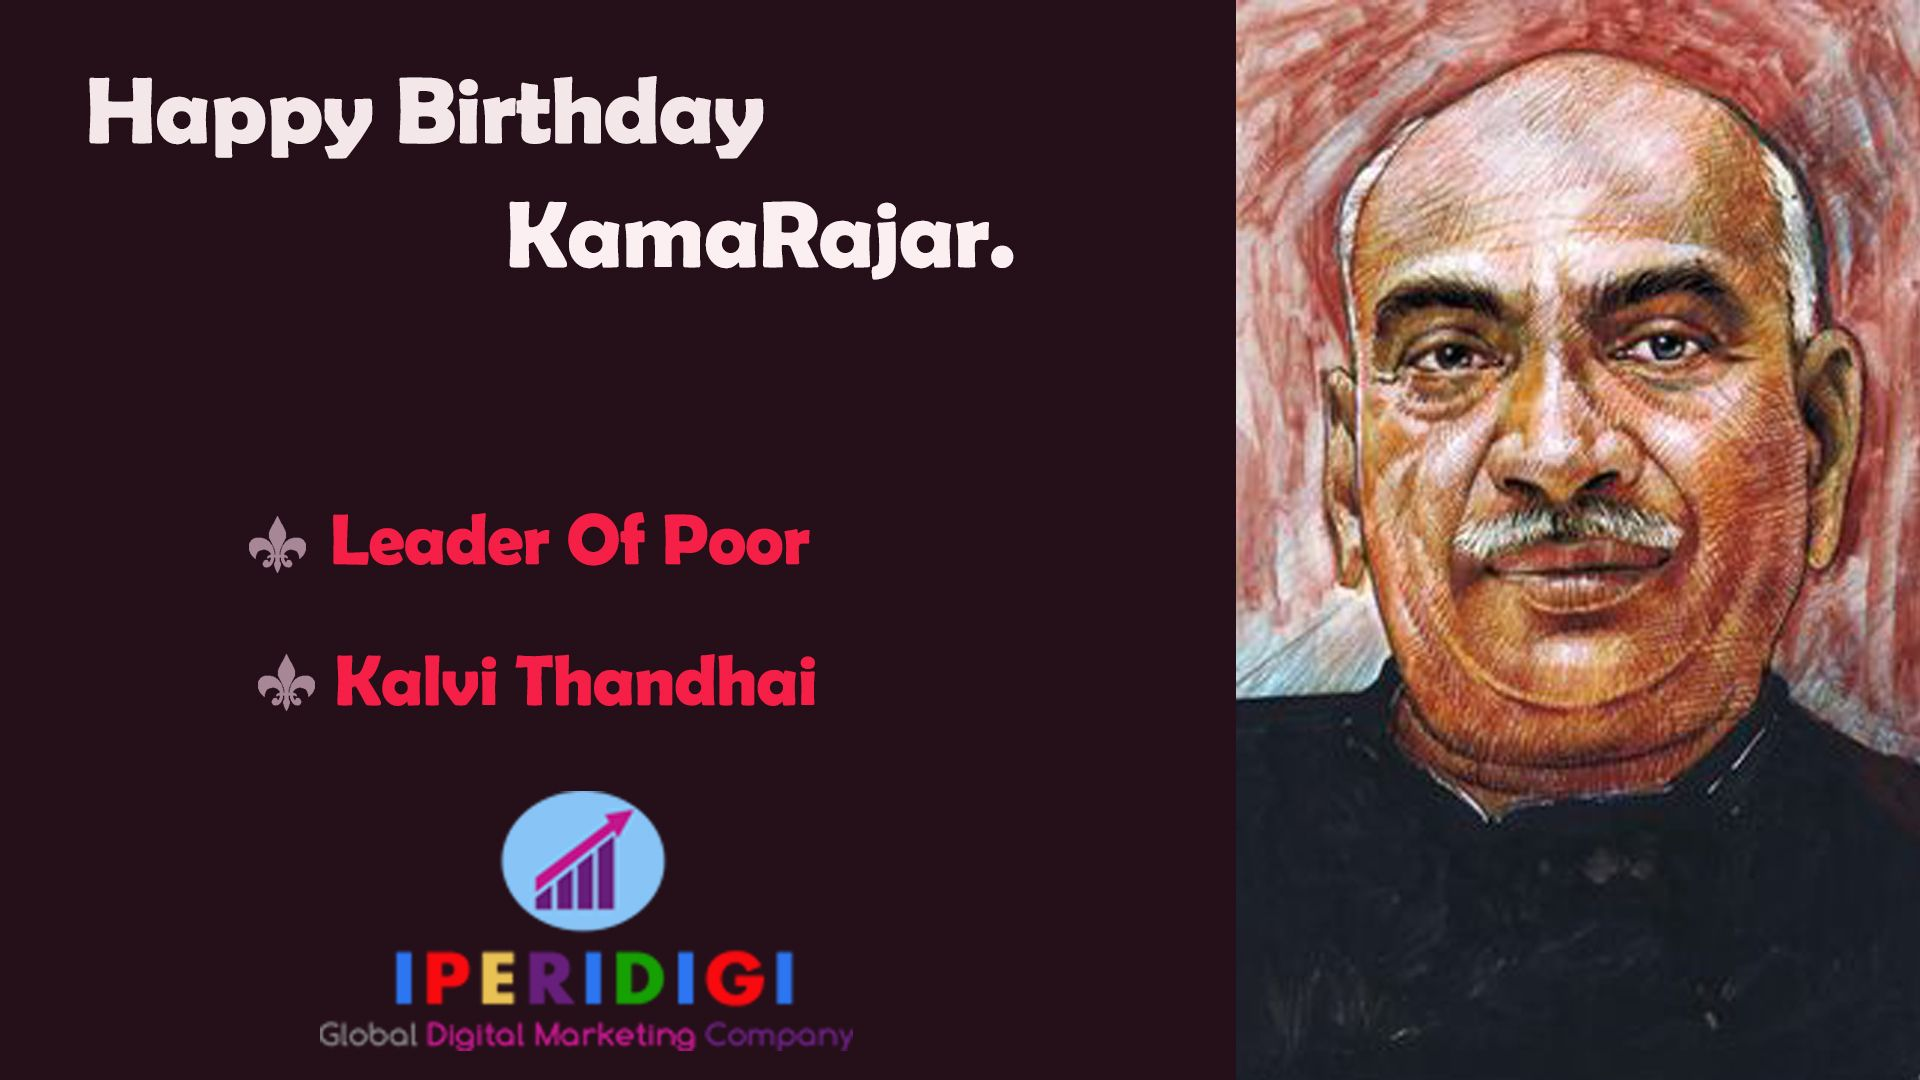 Kamaraj was born on 15 July 1903 in Virudhunagar, Tamil